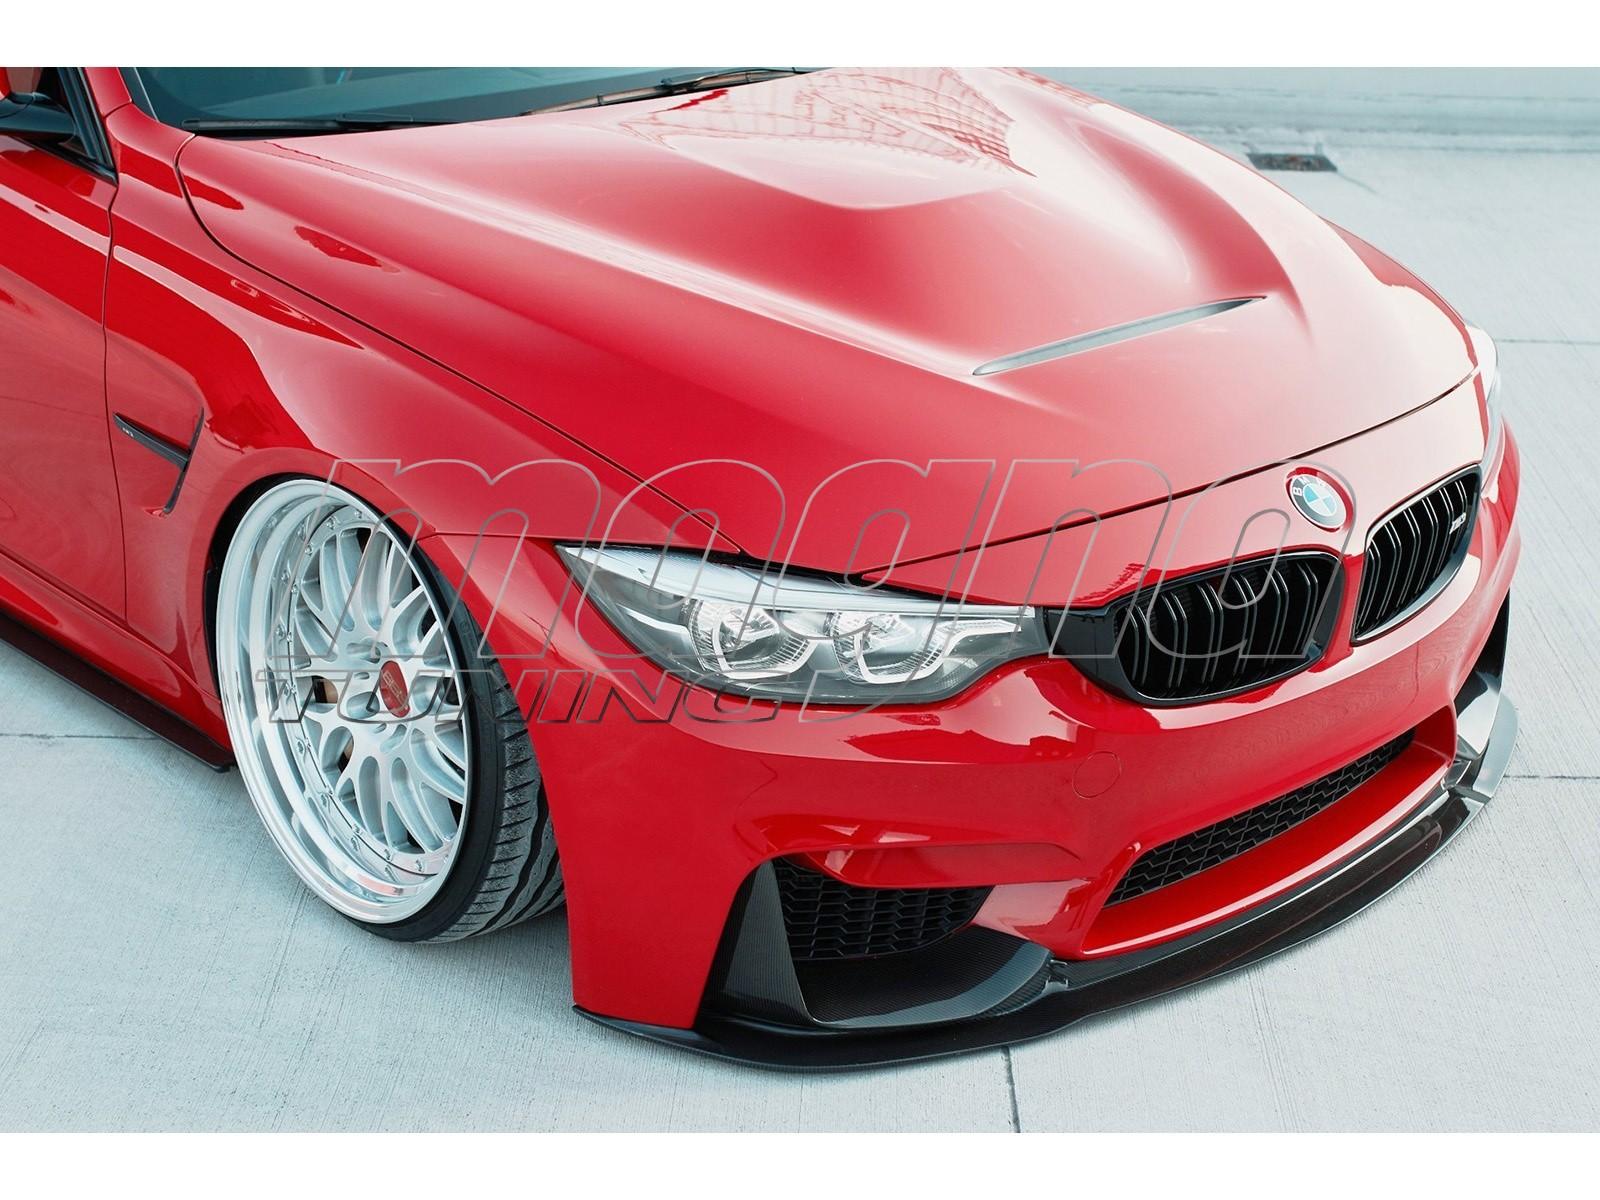 BMW F80 M3 Monster Body Kit